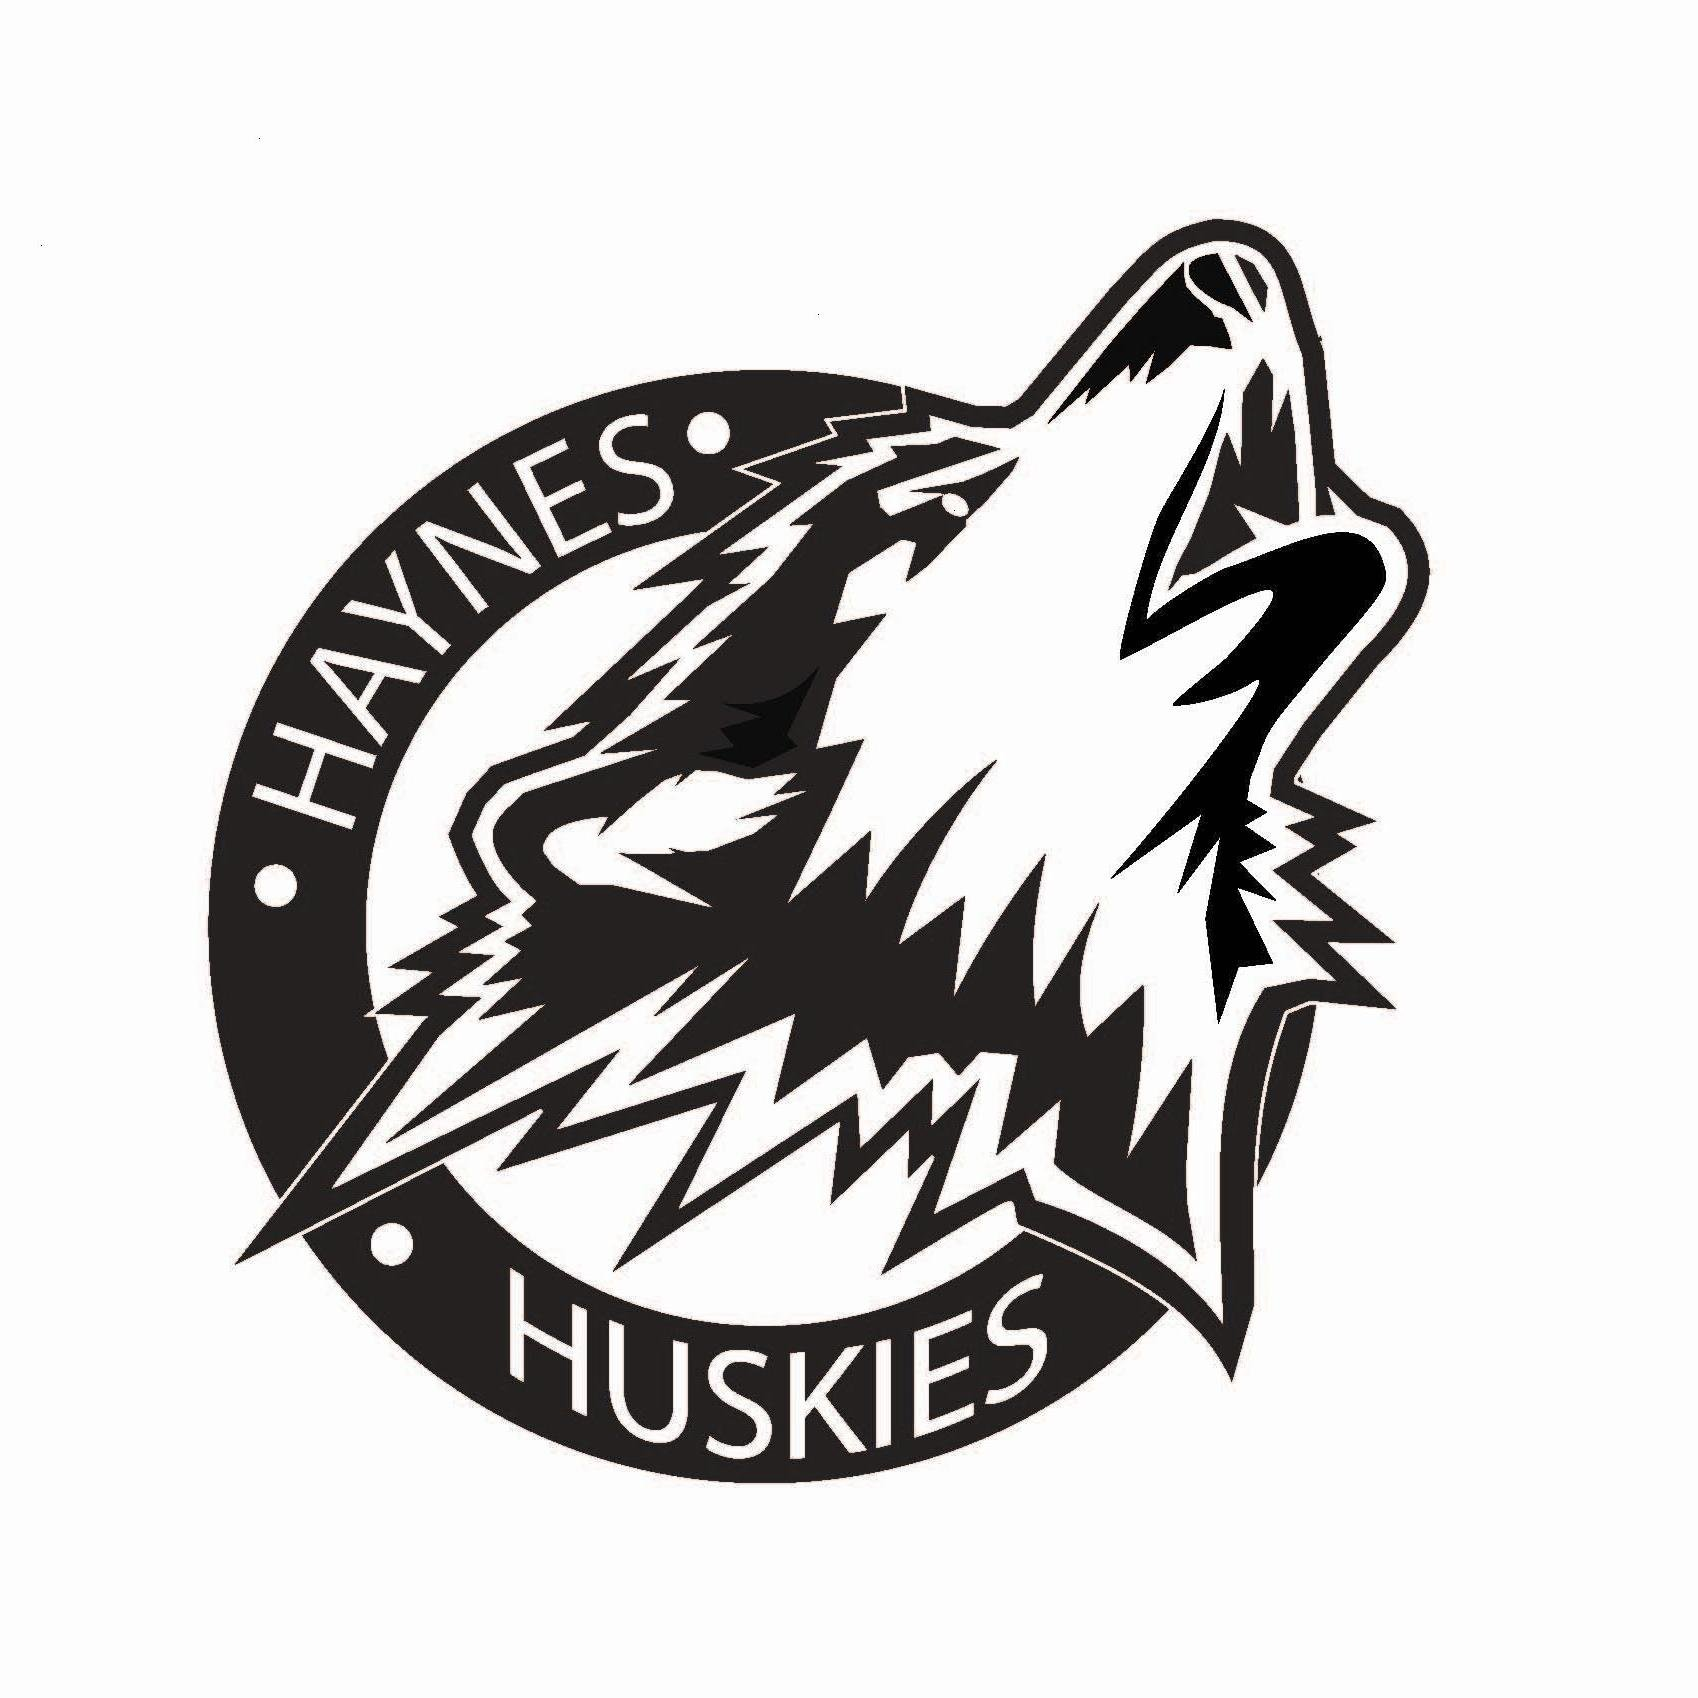 Haynes Elementary on Twitter: